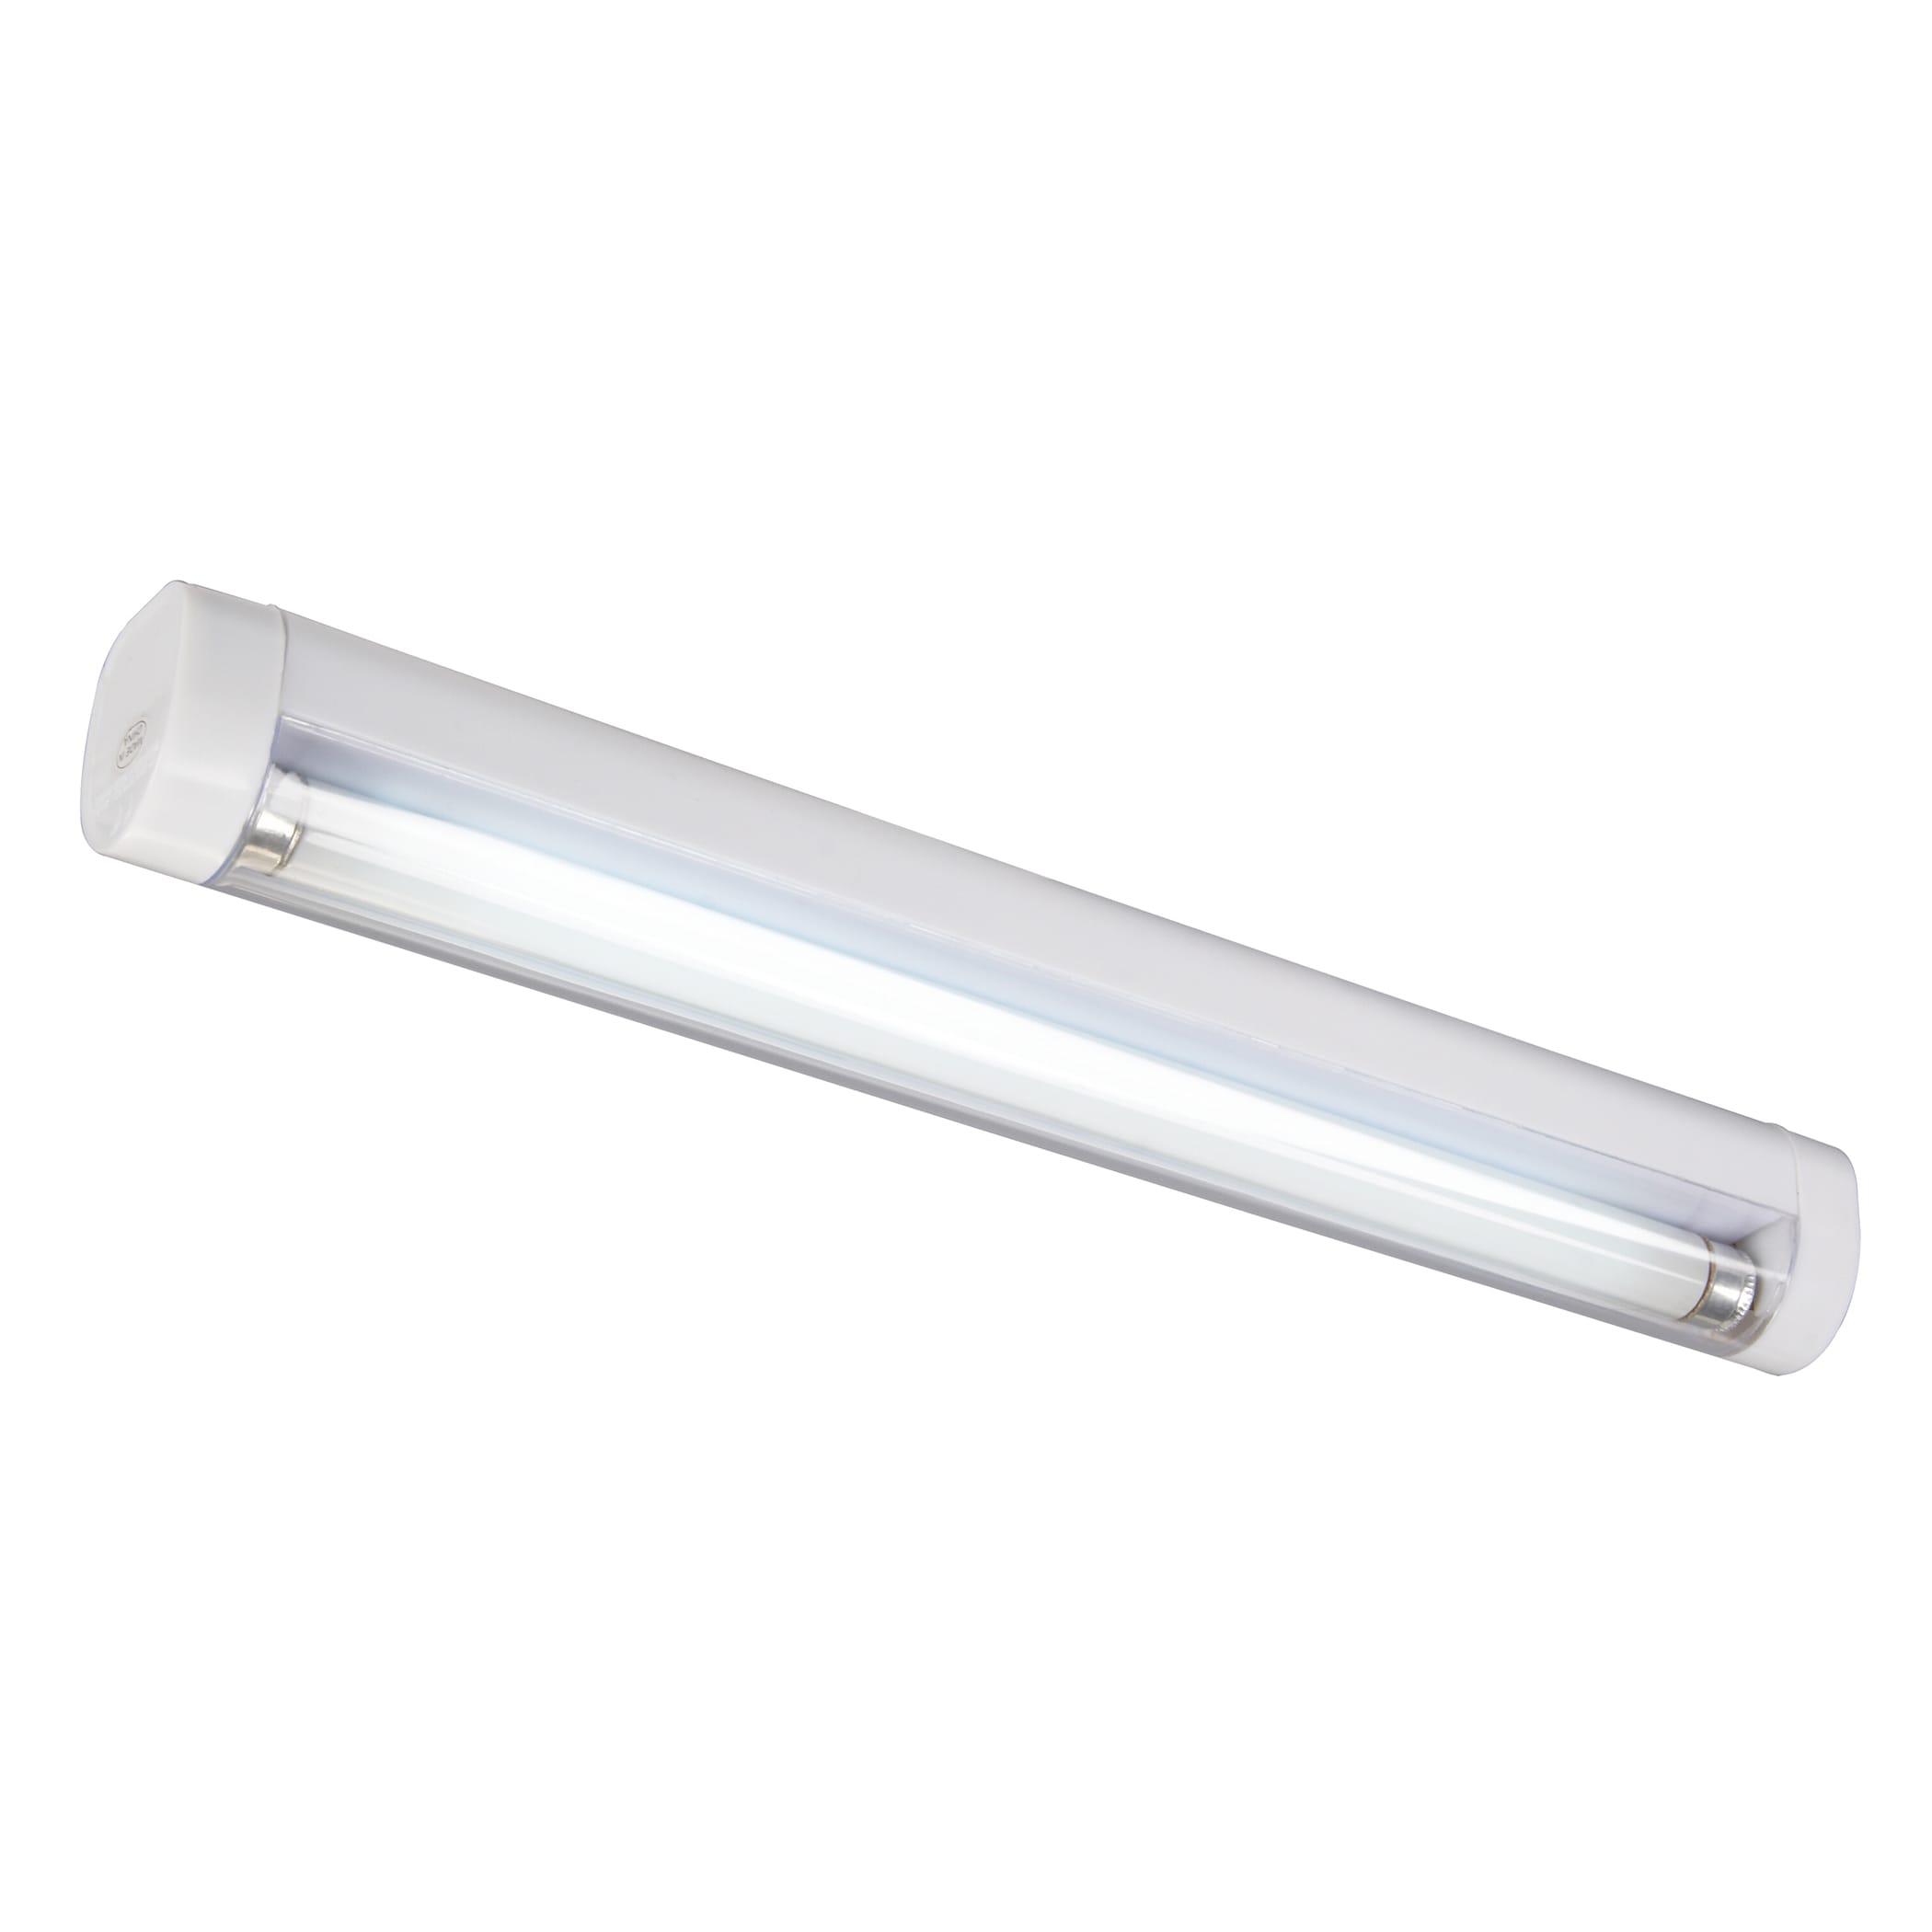 Amertac 73040CC 12' Fluorescent Utility Light (Lights), M...